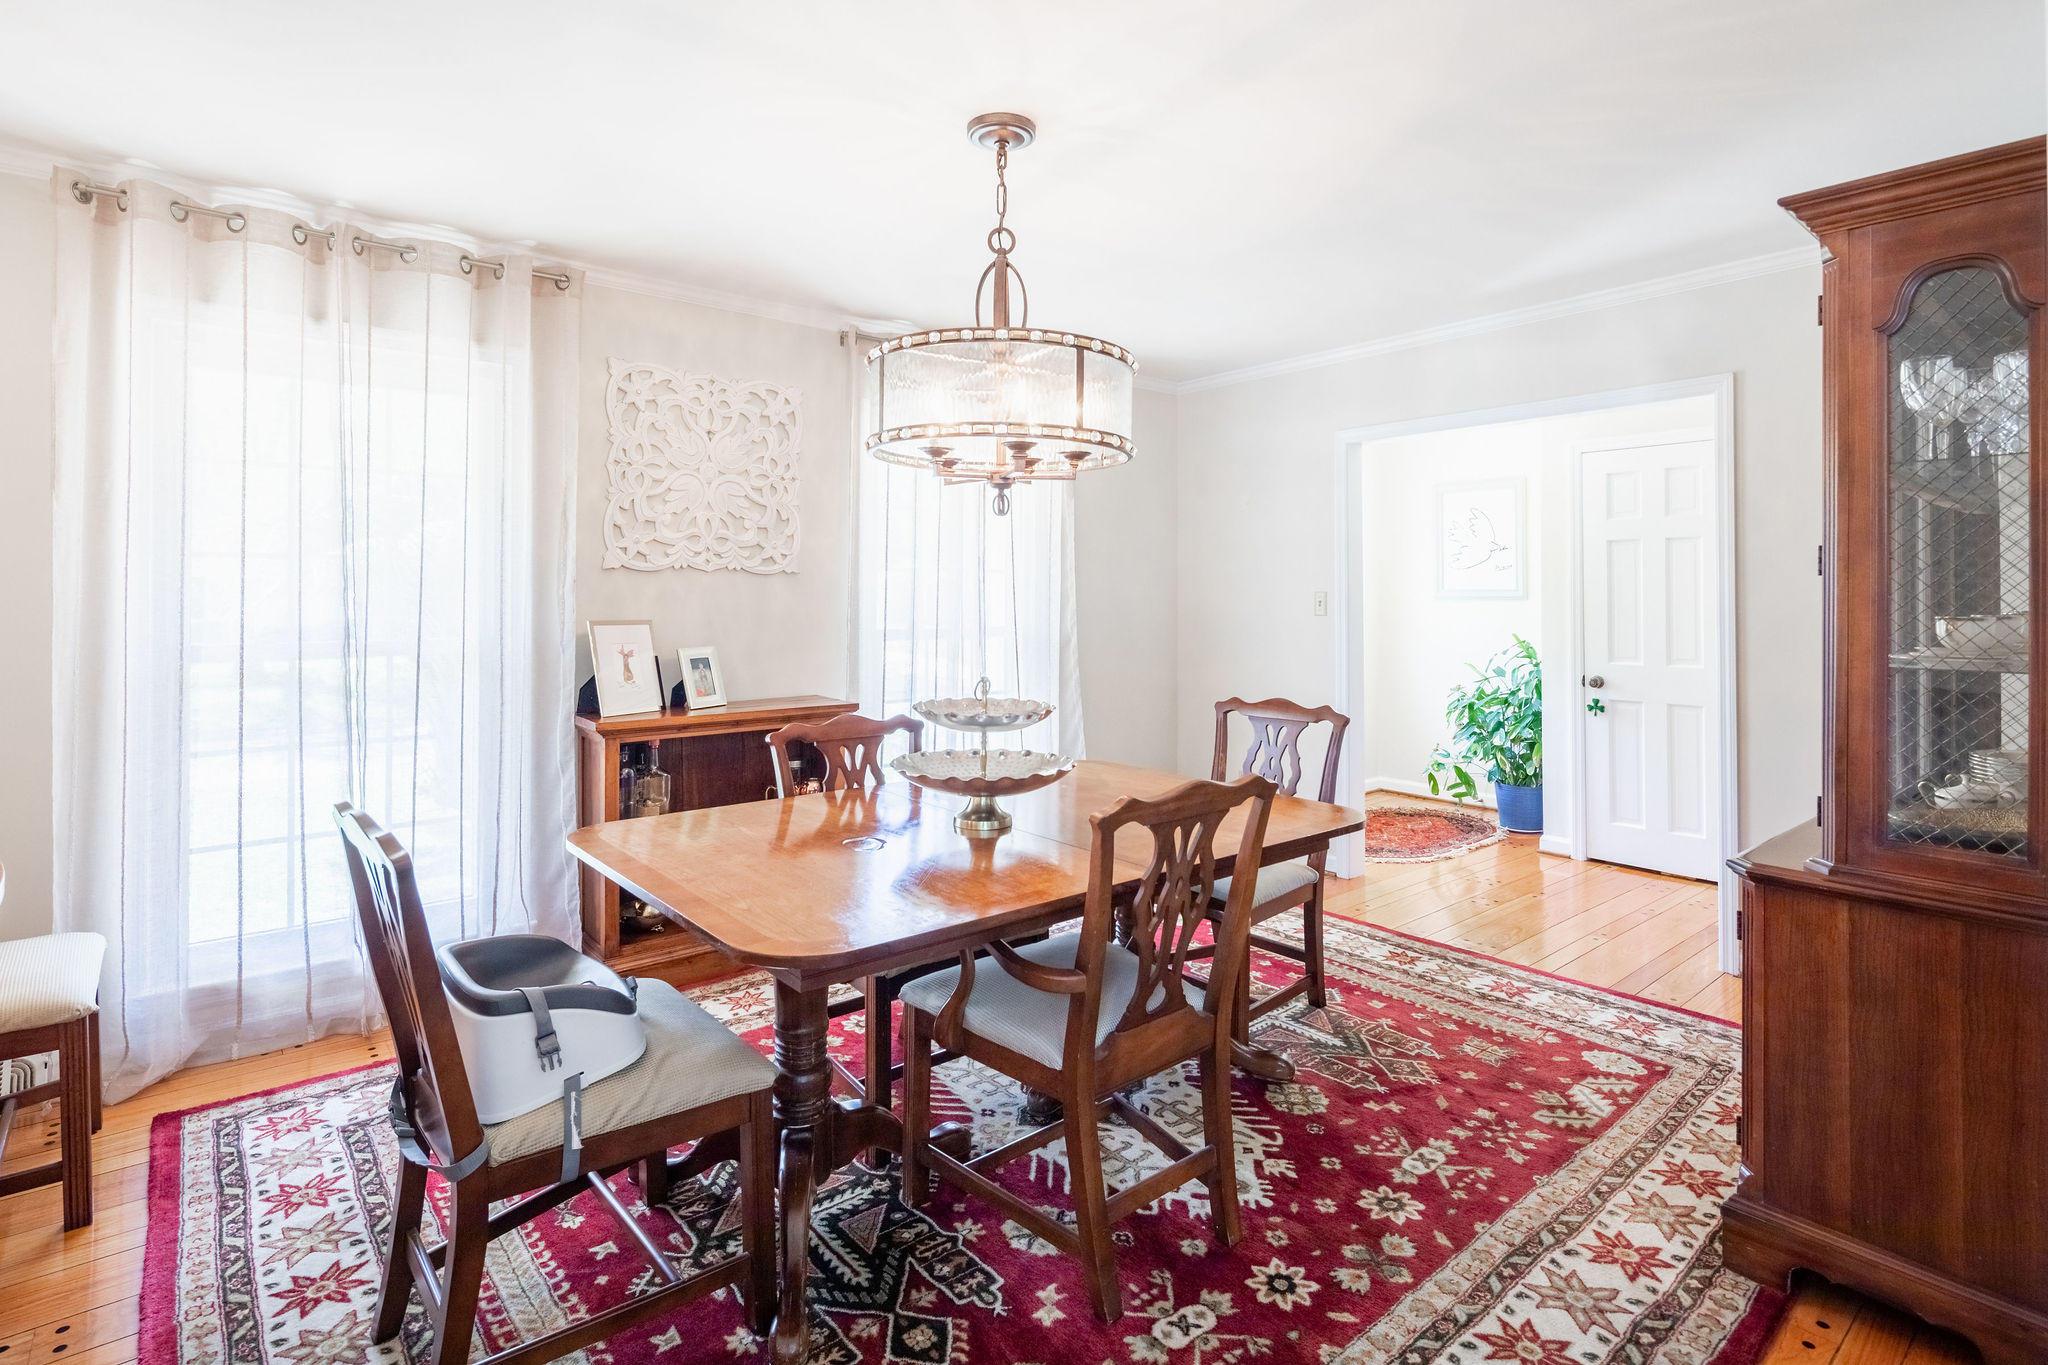 Cooper Estates Homes For Sale - 1058 Cottingham, Mount Pleasant, SC - 12